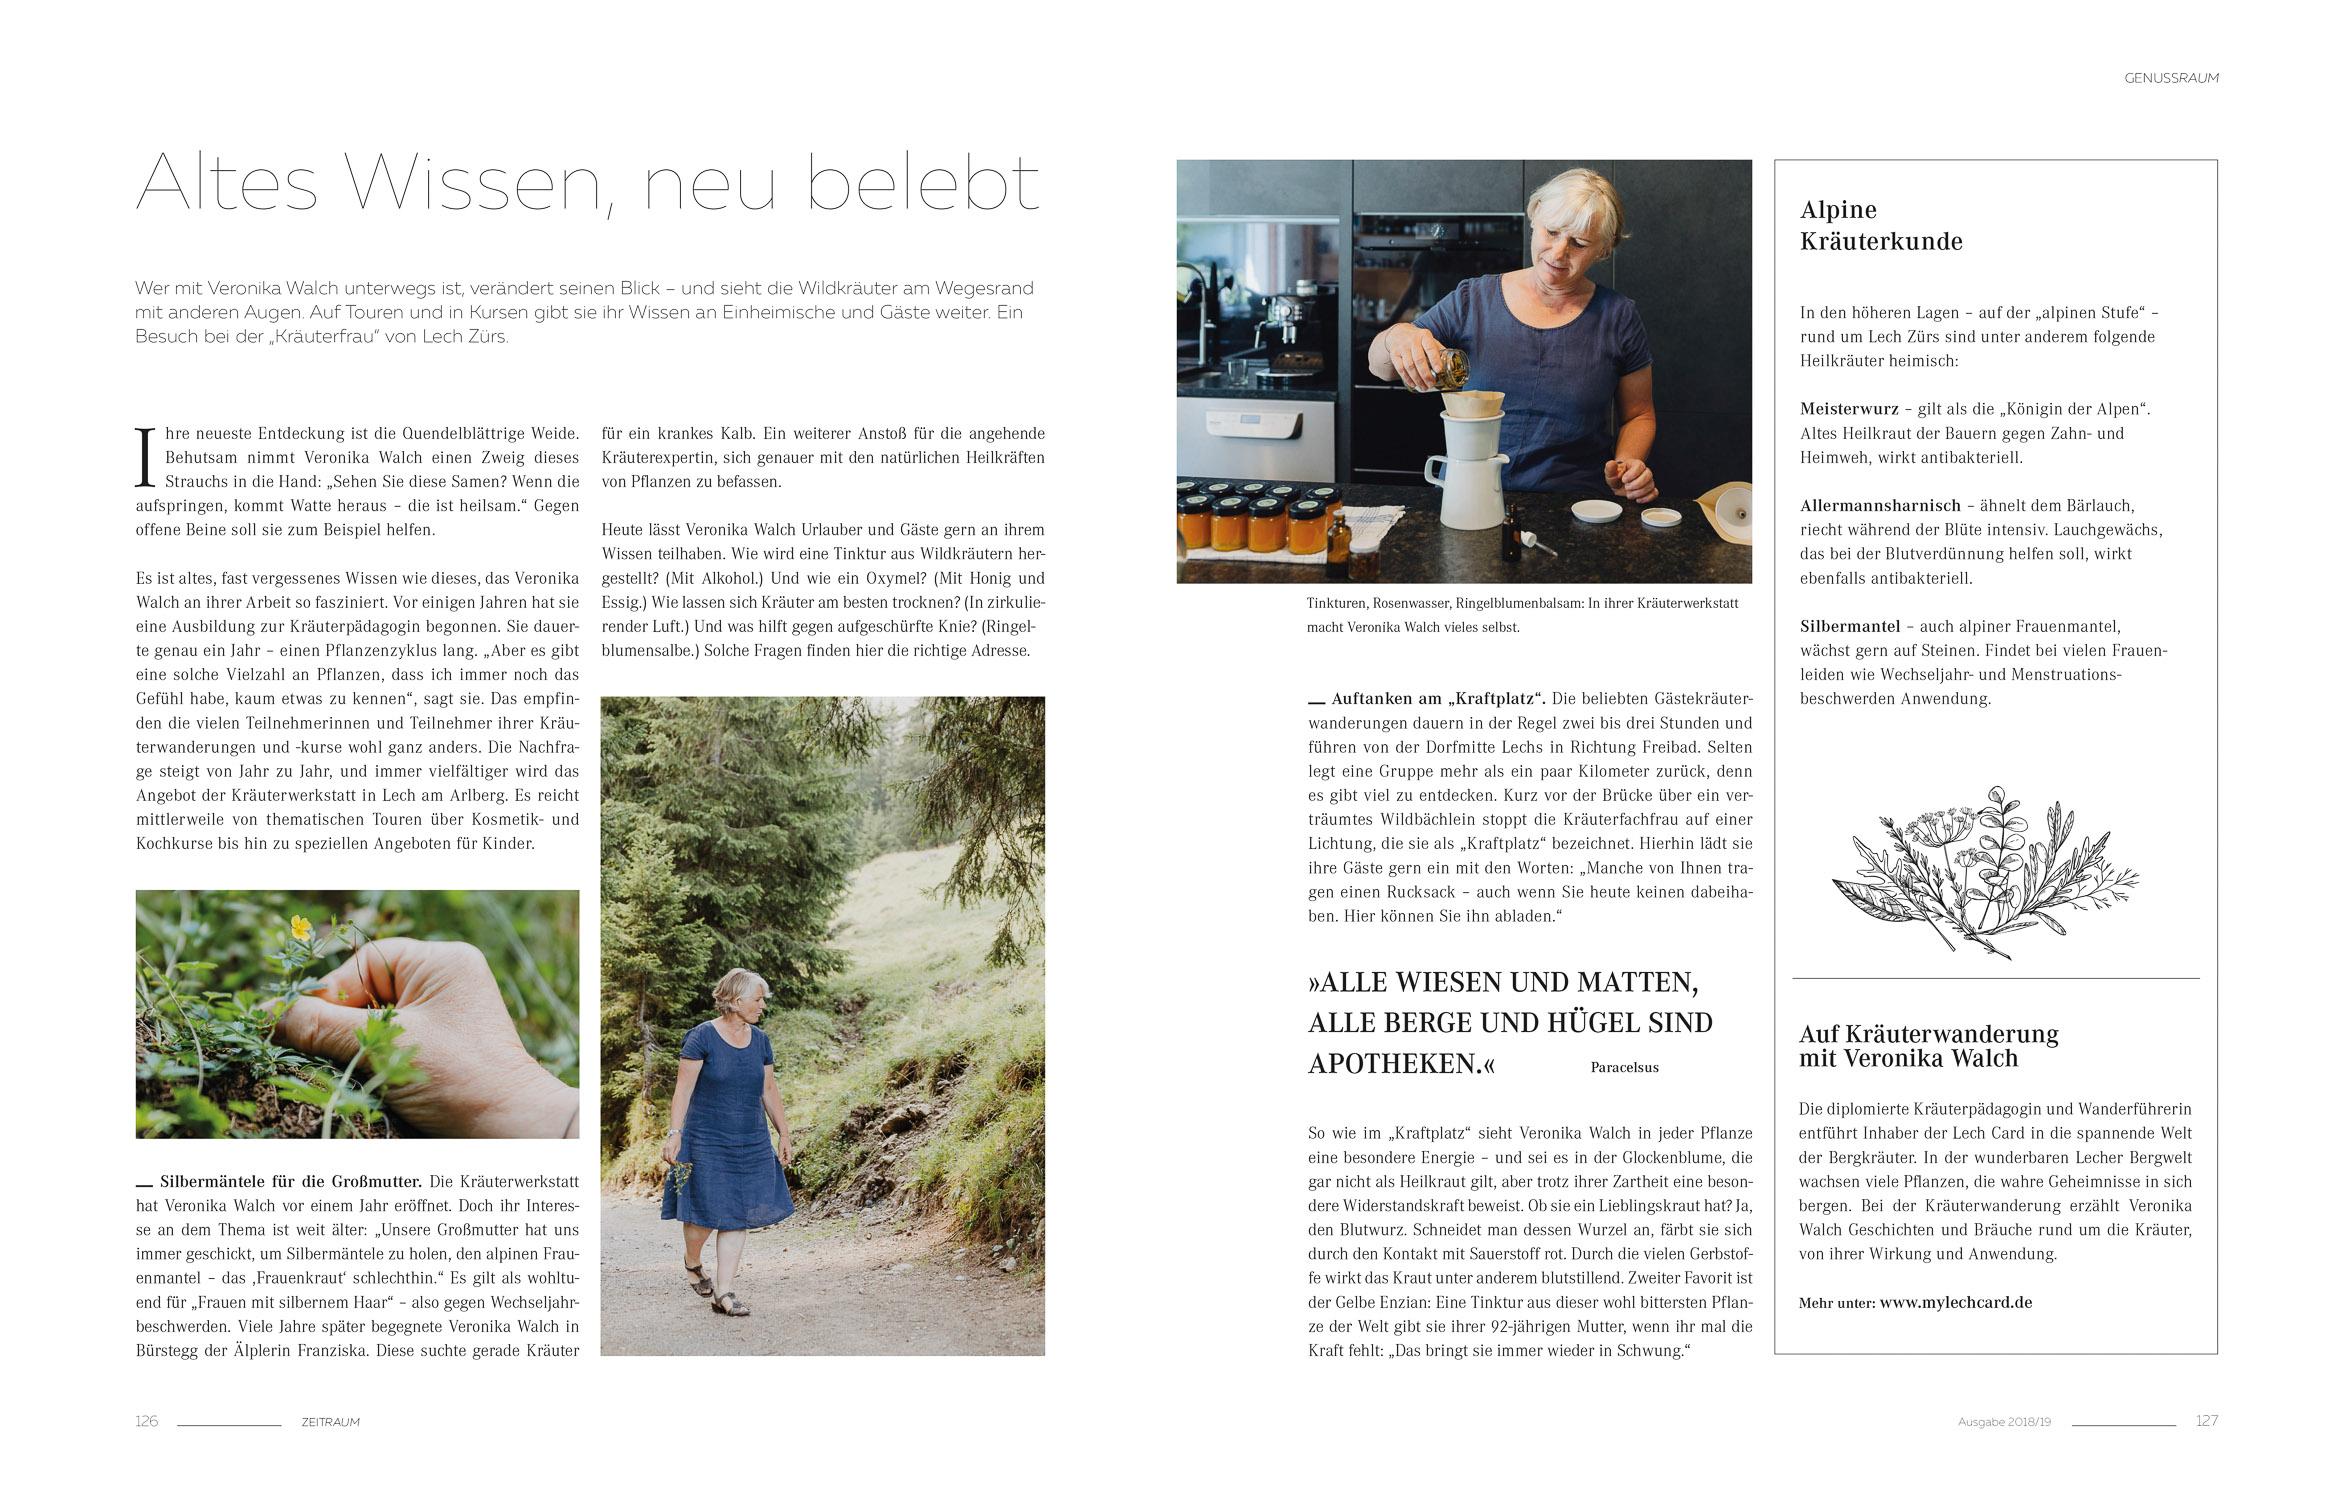 Referenz, Lisa Dünser Fotografie, ZeitRaum Magazin